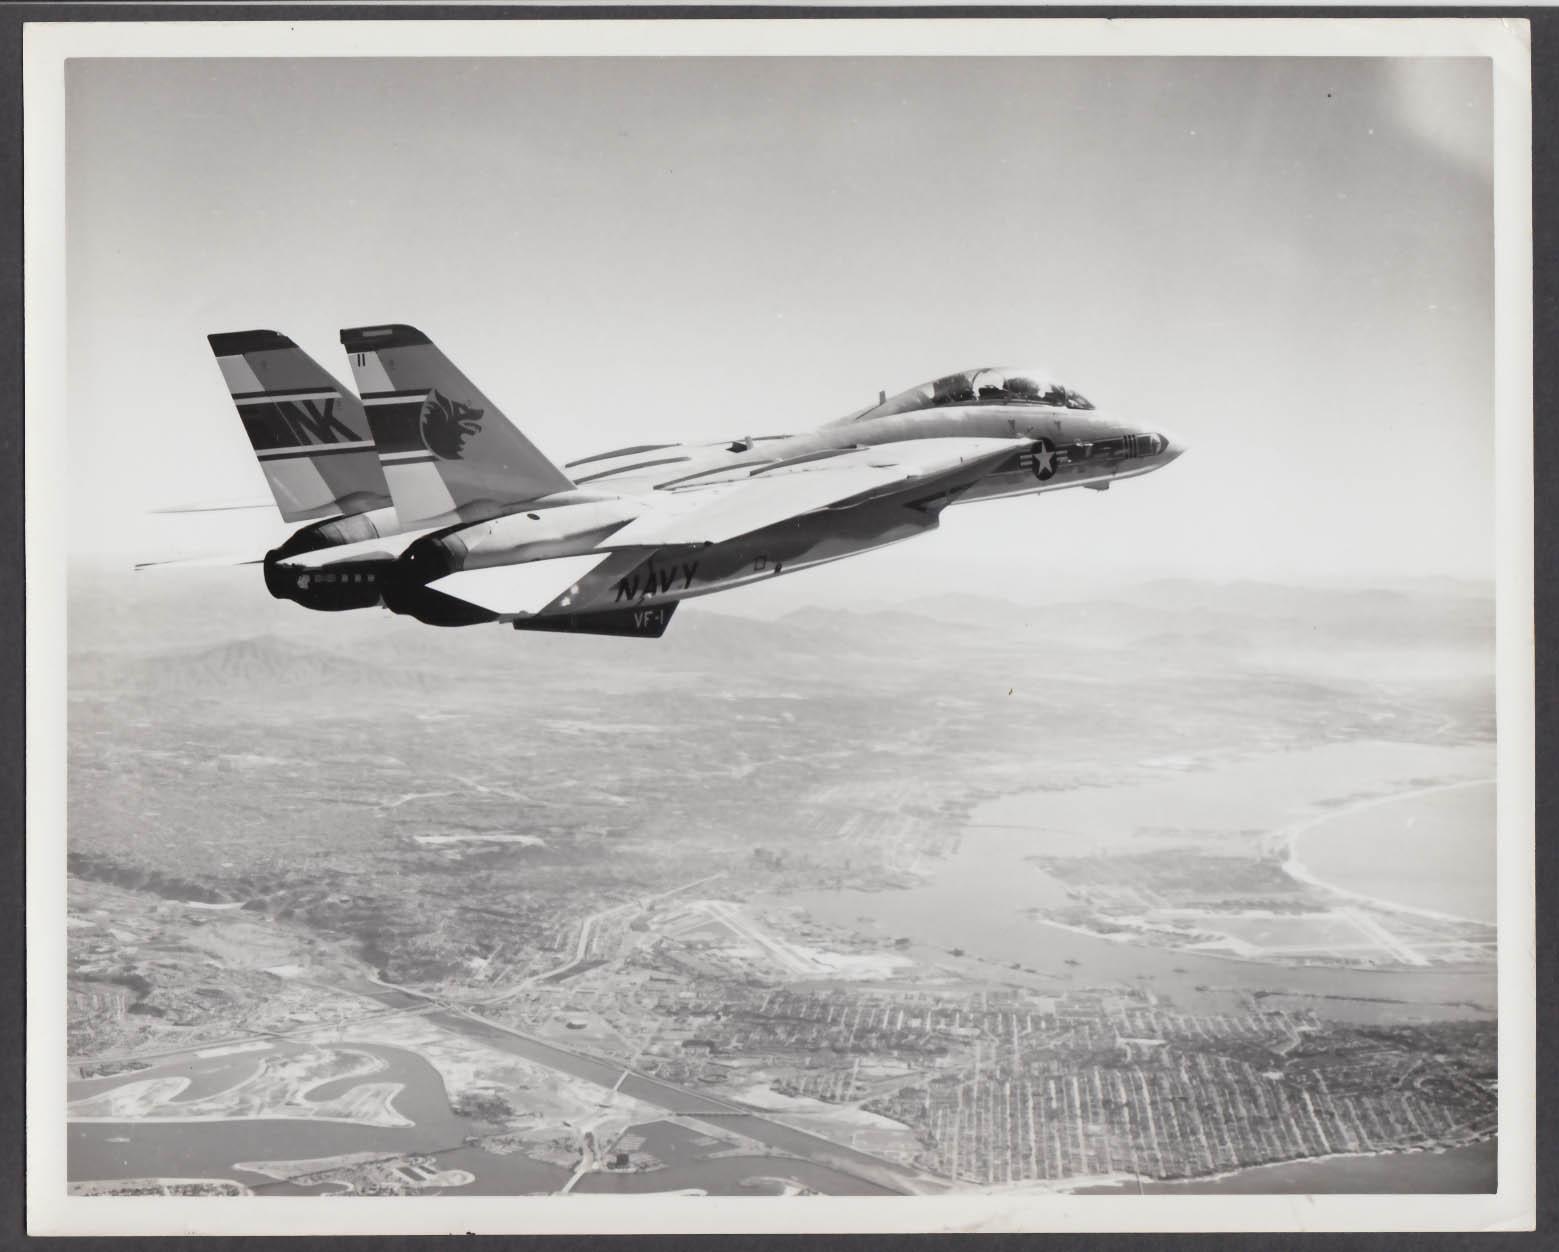 Image for US Navy VF-1 F-14 Tomcat in flight 8x10 photo